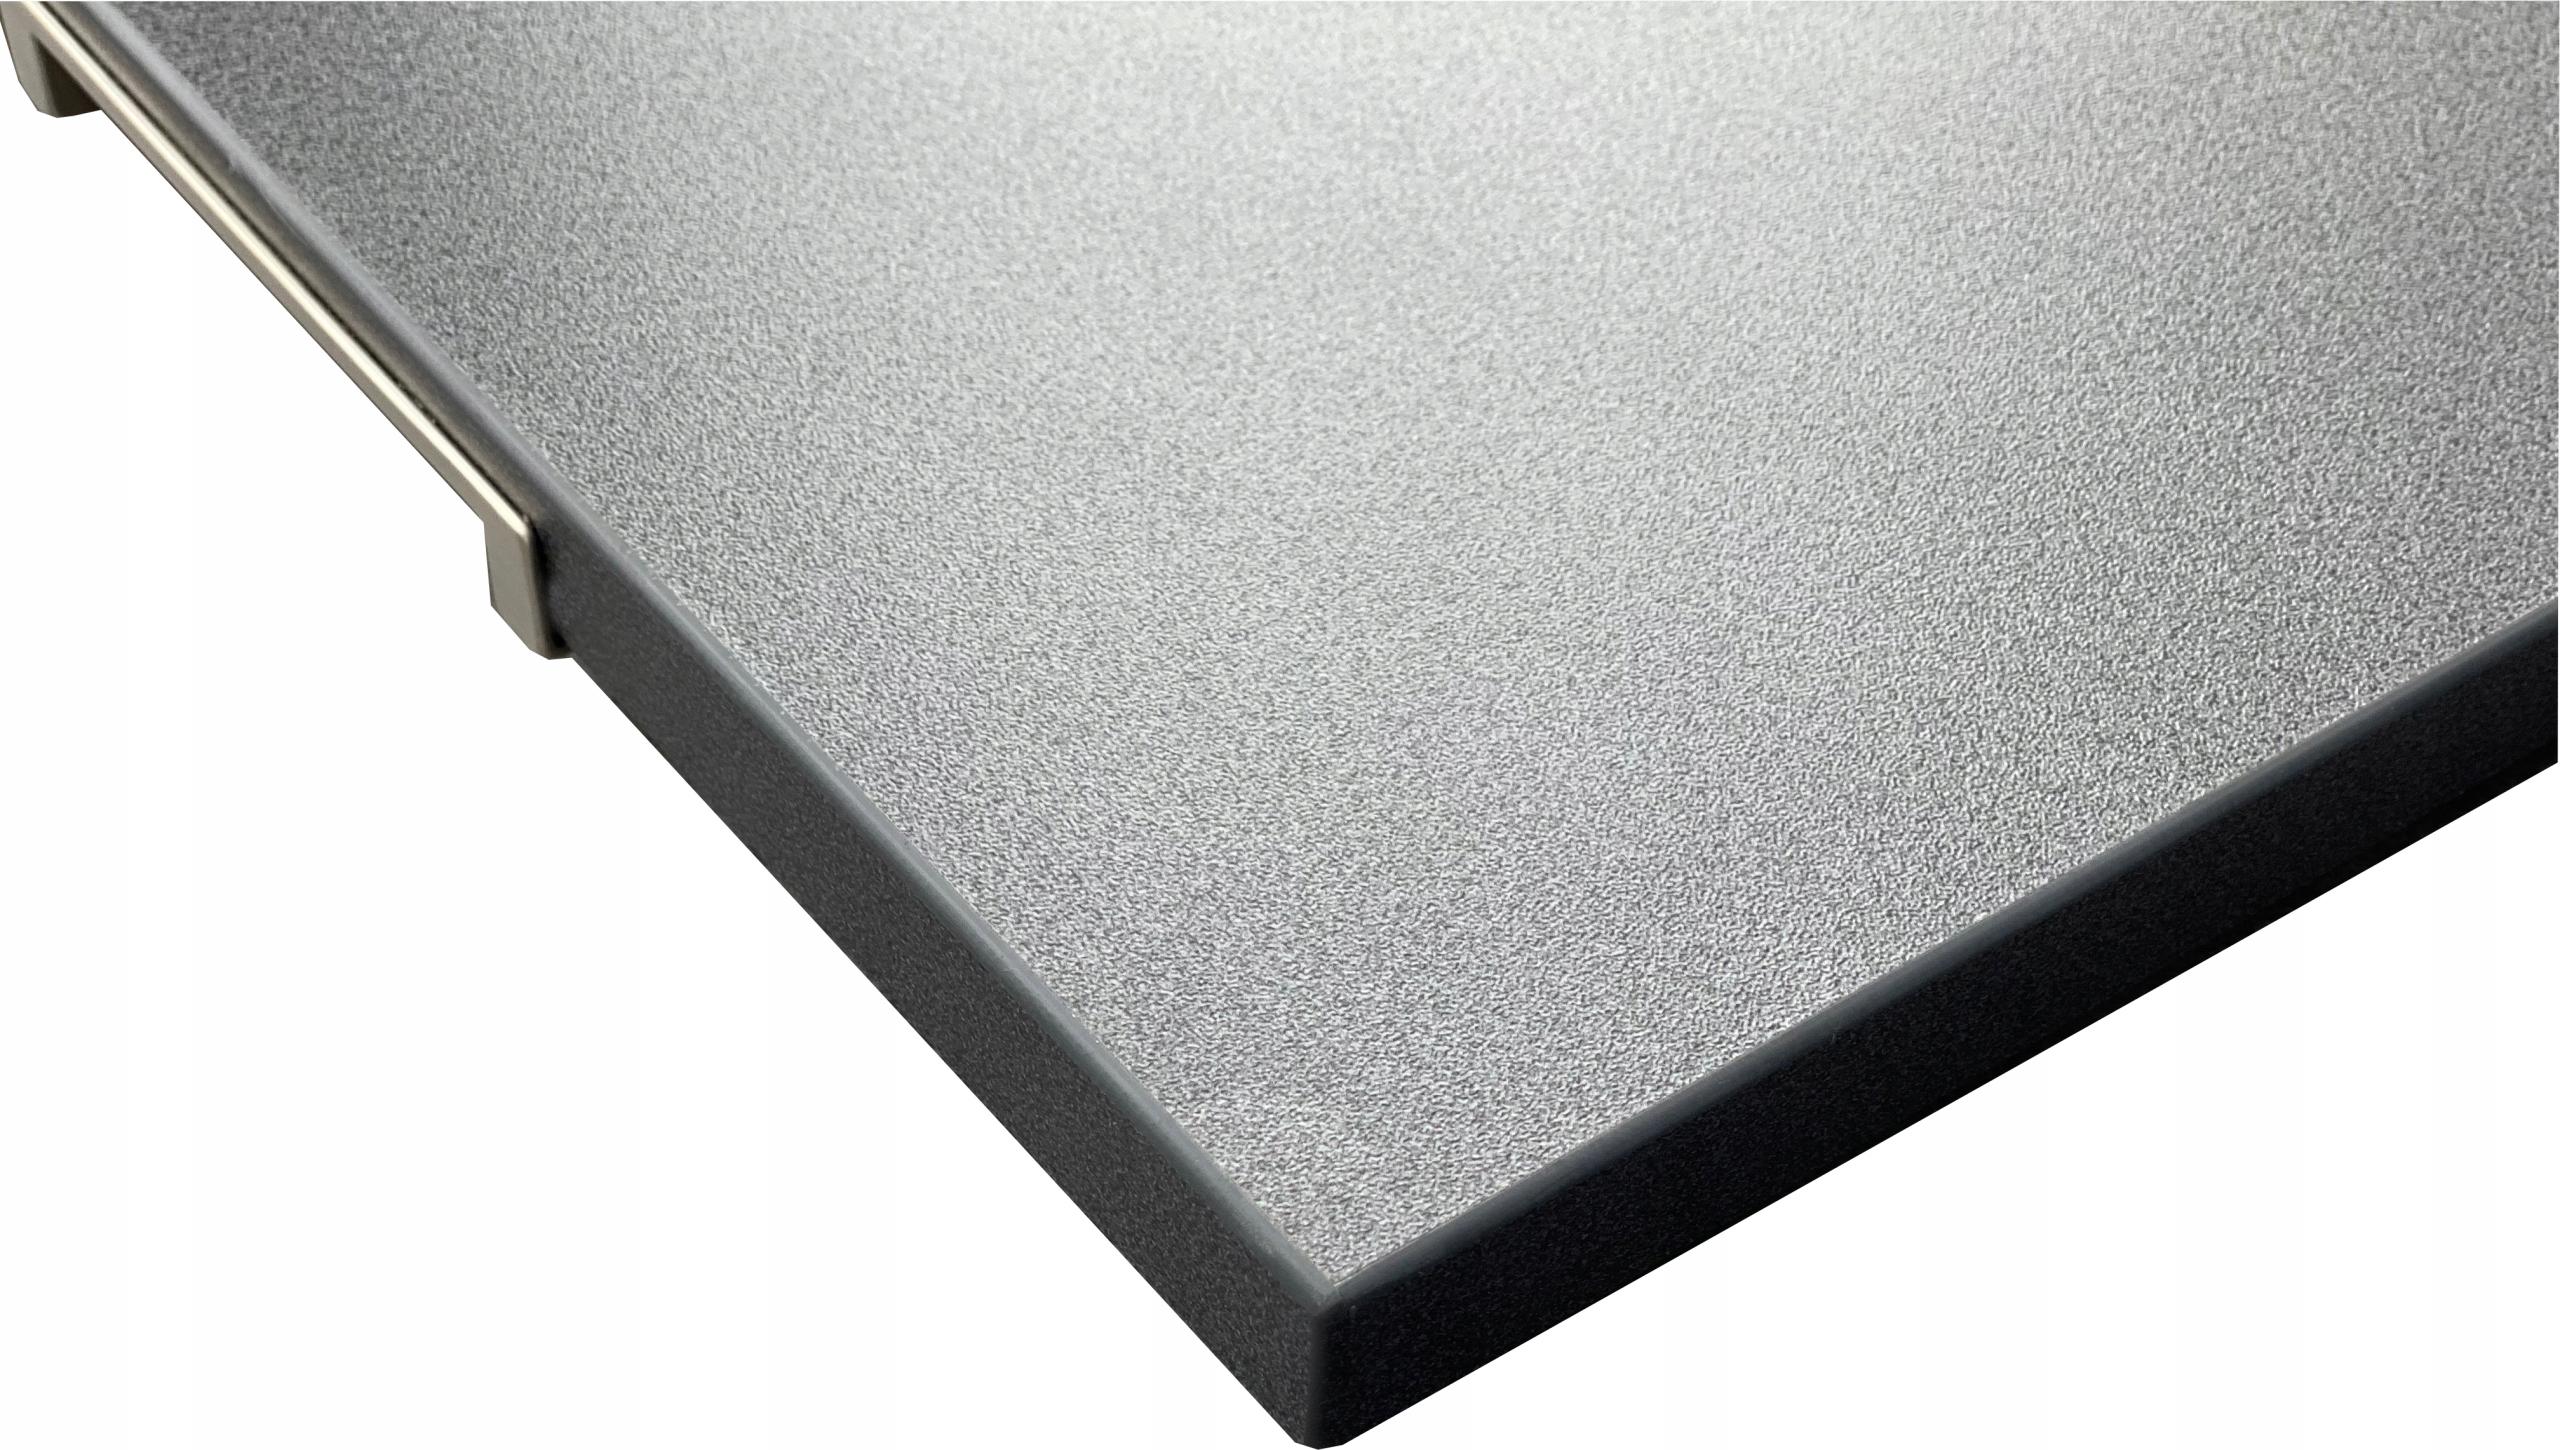 Подставка, тарелка для Thermomix TM6, TM5, Lidlomix